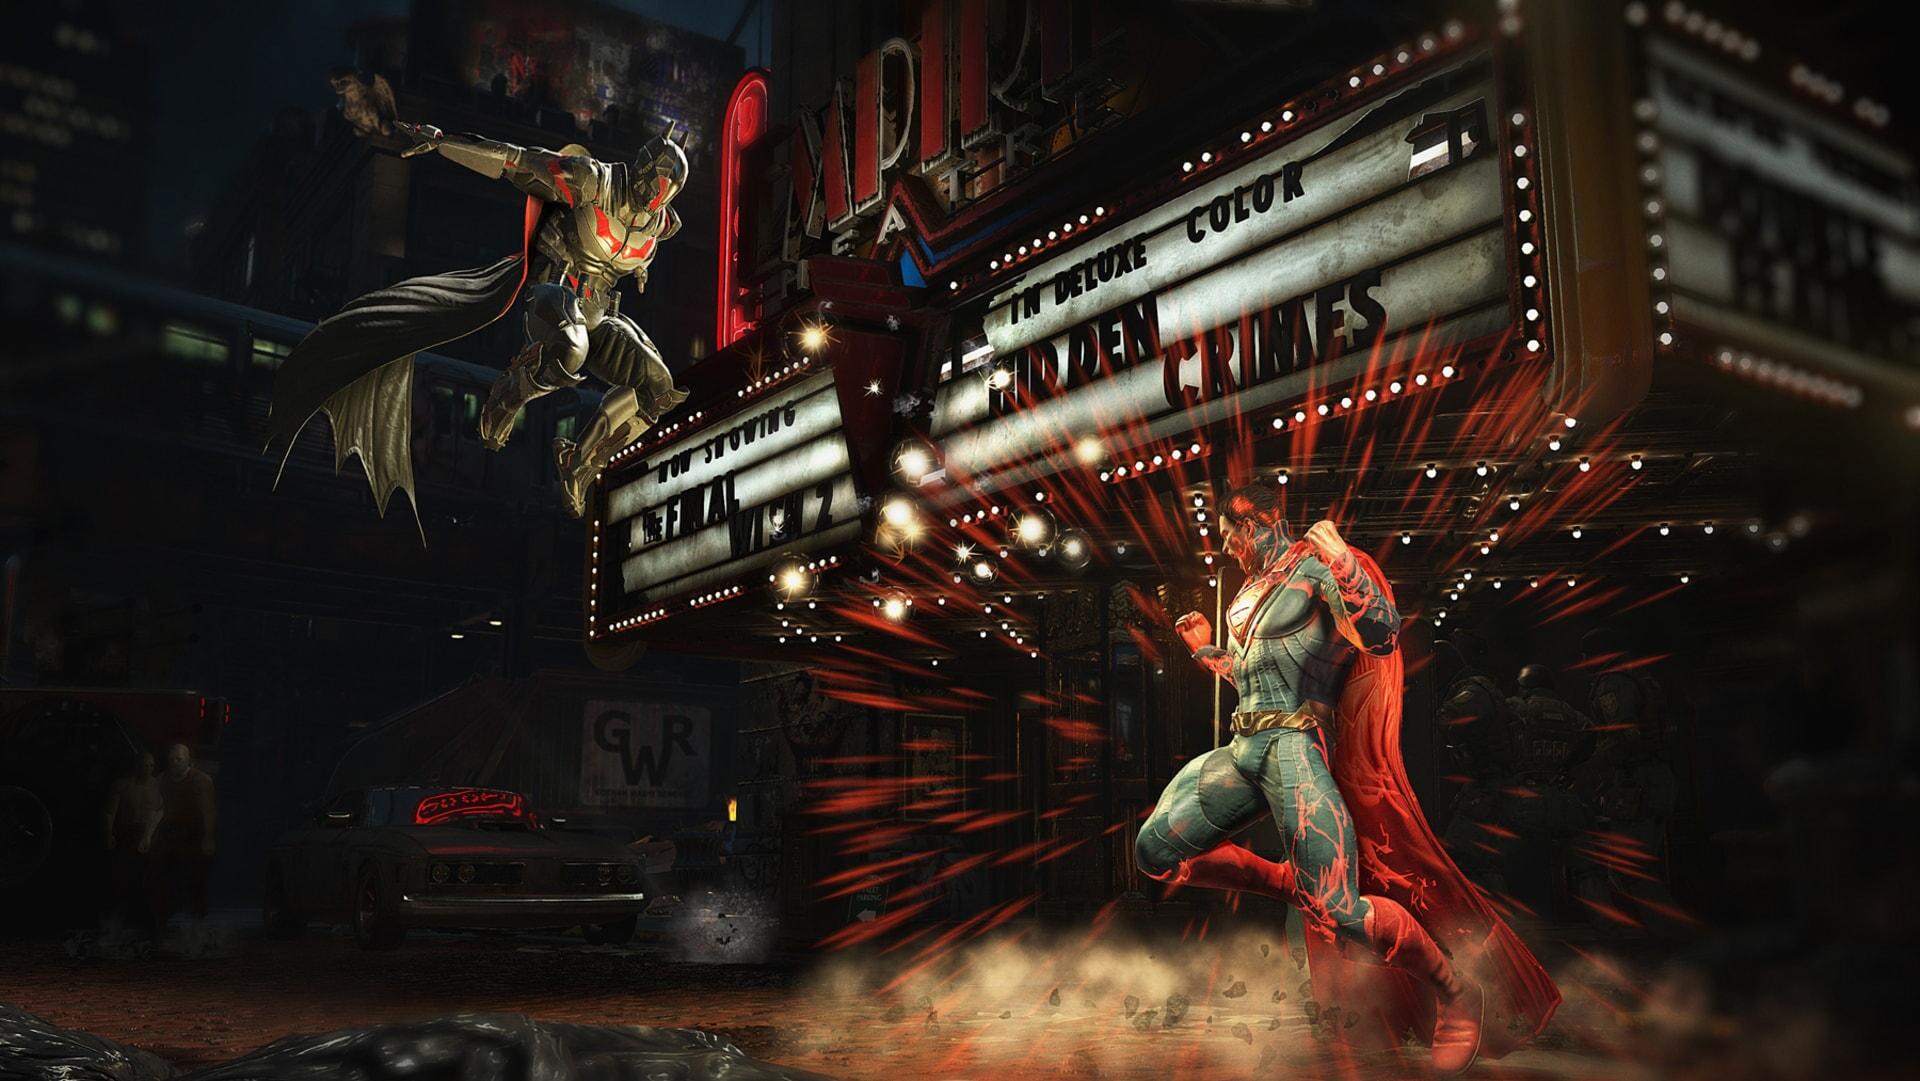 Injustice 2: Batman and Superman fighting